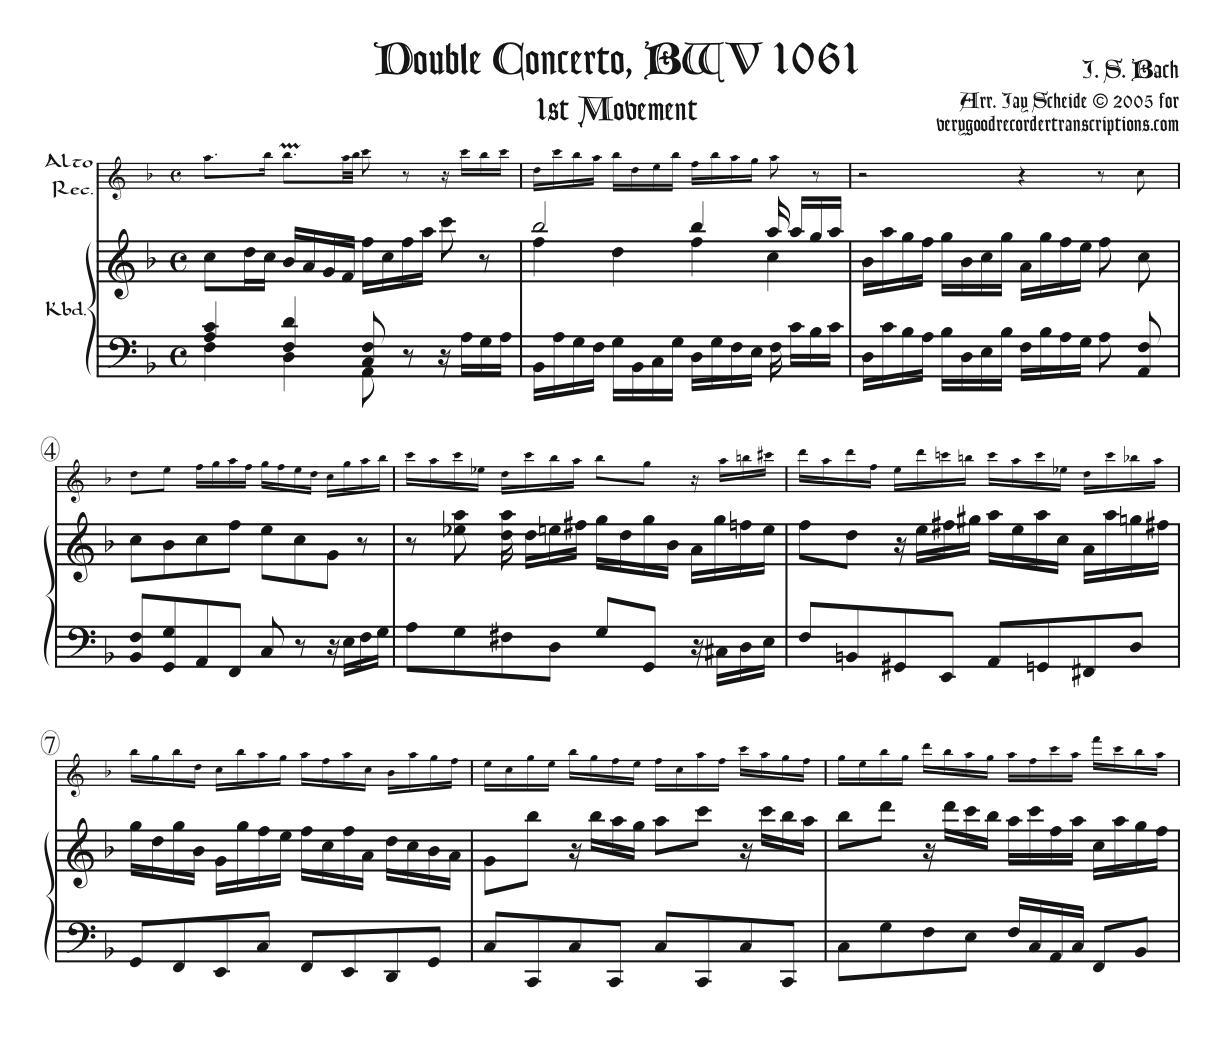 Concerto No. 2 for 2 Harpsichords, BWV 1061 complete